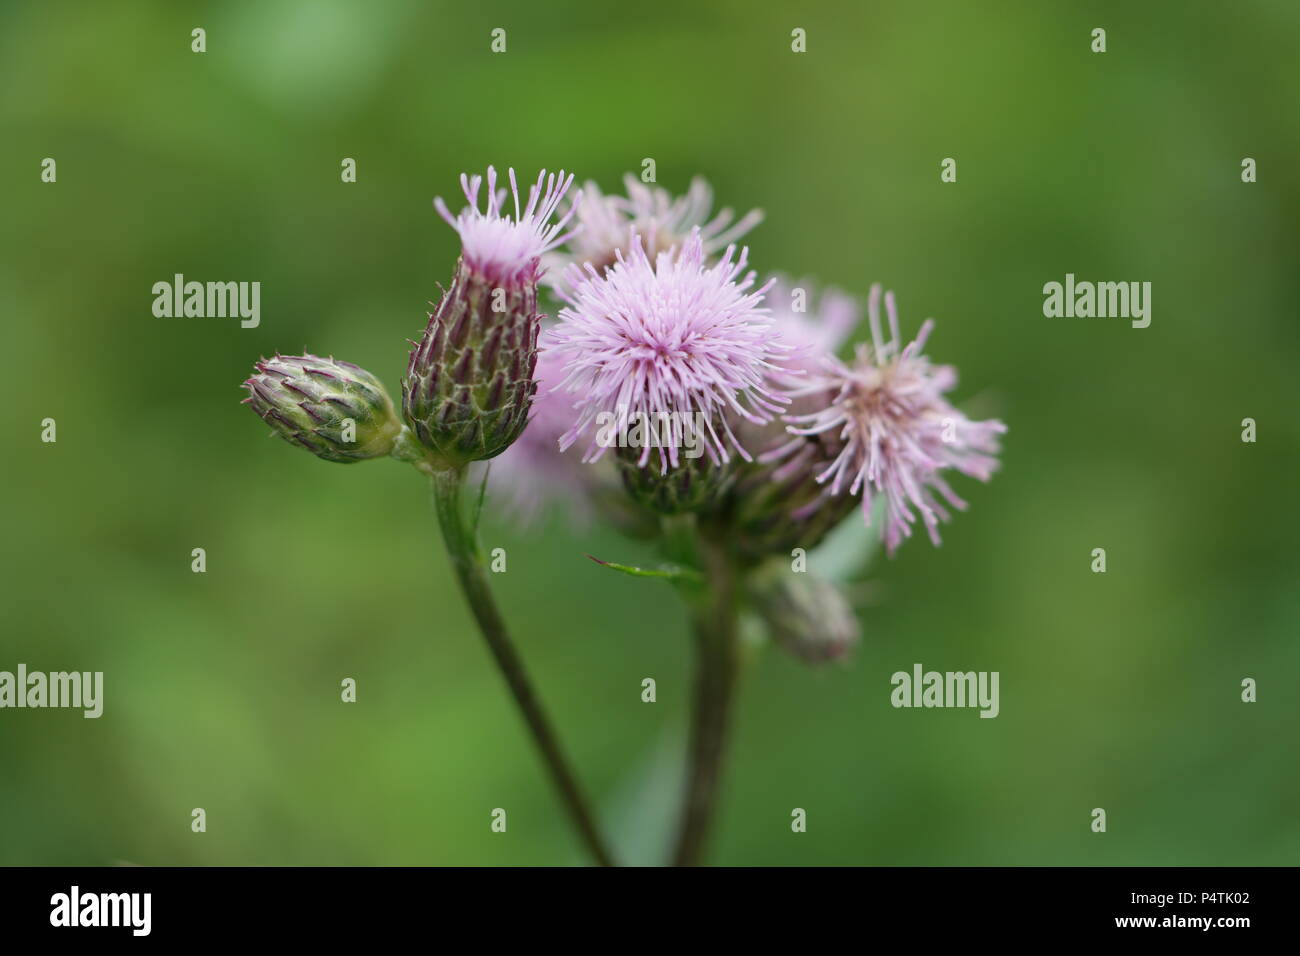 Cirsium arvense / Creeping Thistle / Acker-Kratzdistel, Ackerdistel Stock Photo